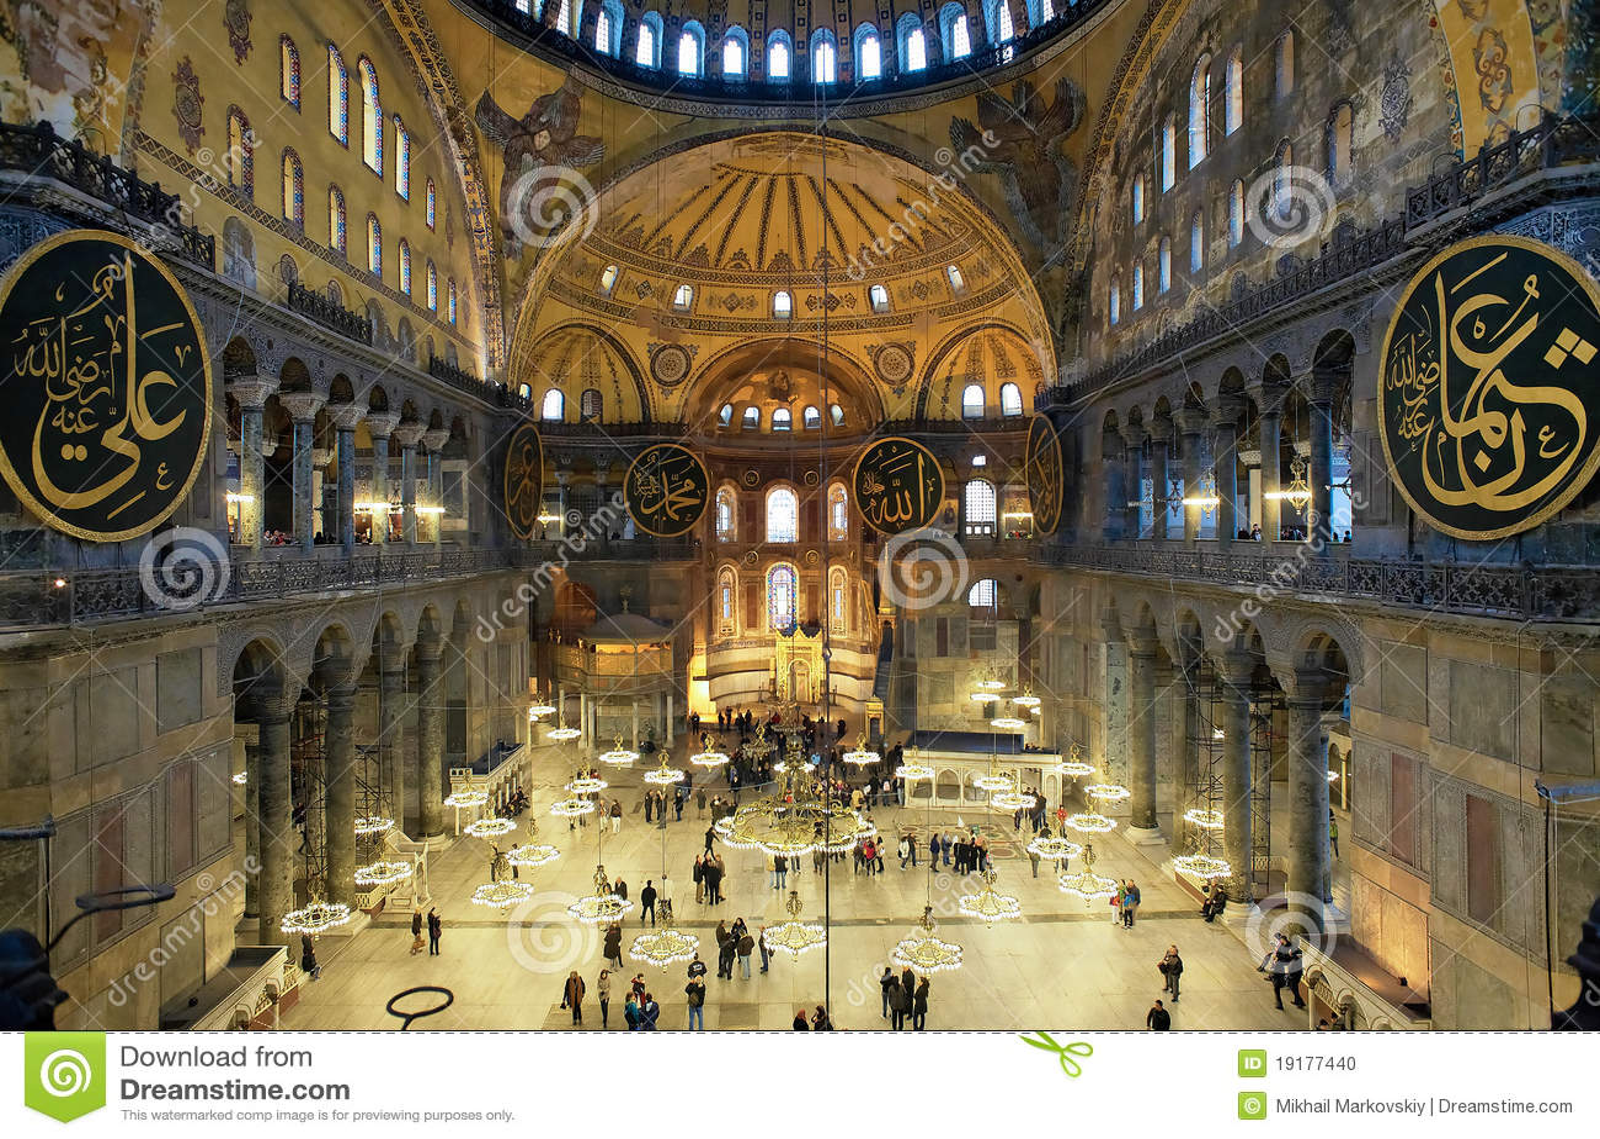 Innenraum Des Hagia Sophia In Istanbul Stockfoto Bild